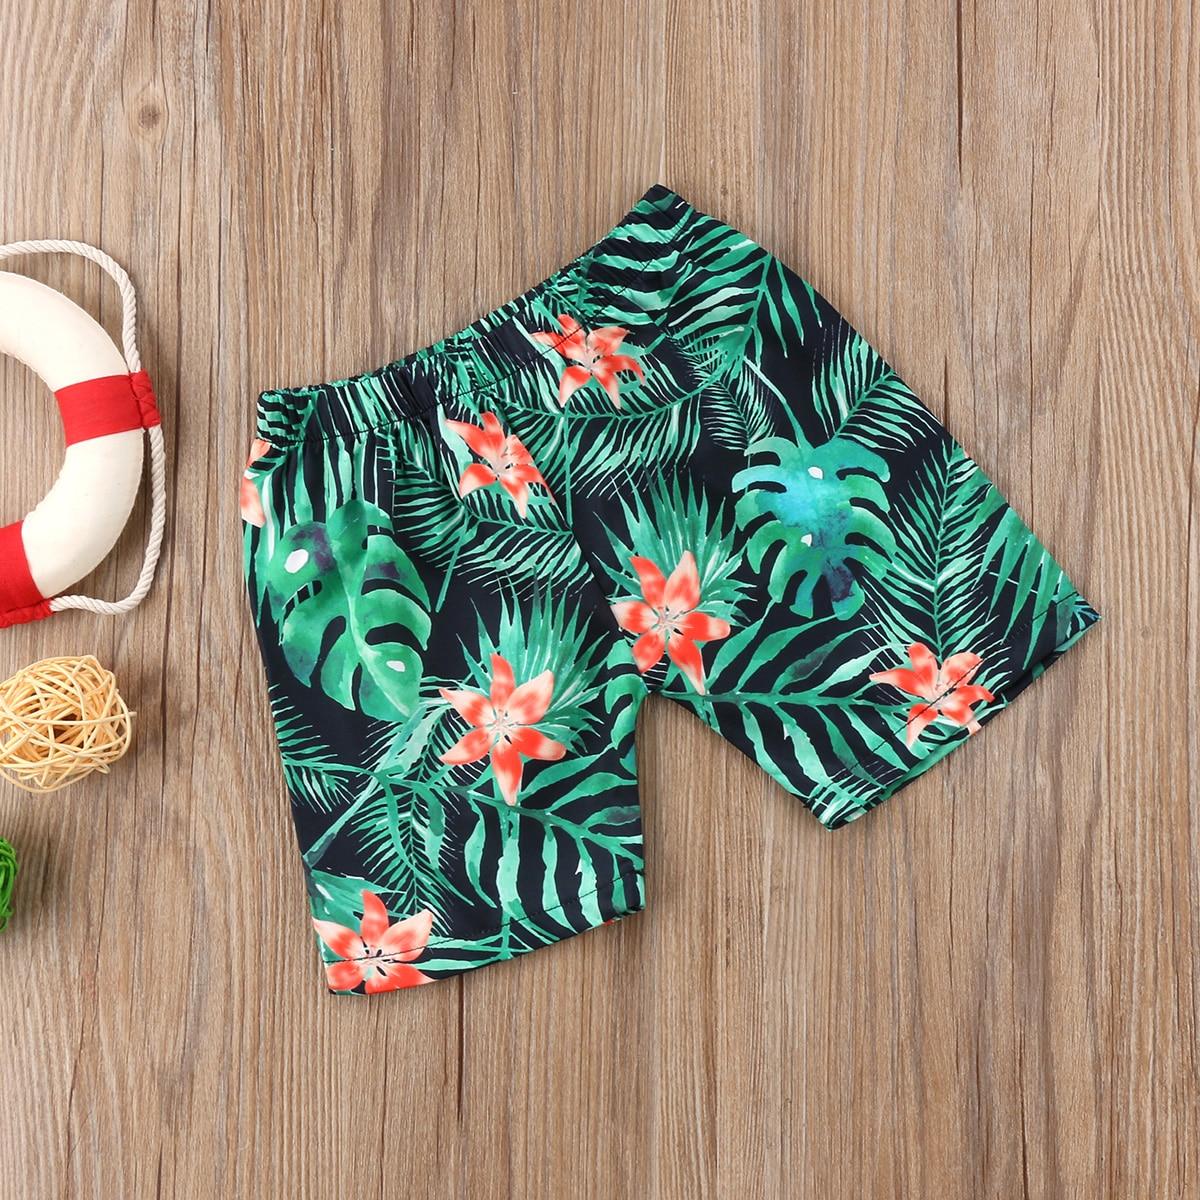 Kids Boy Swimming Trunks Board Shorts Boarder Baby Swim Hawaiian Beach Shortpants Trunks Boys Summer